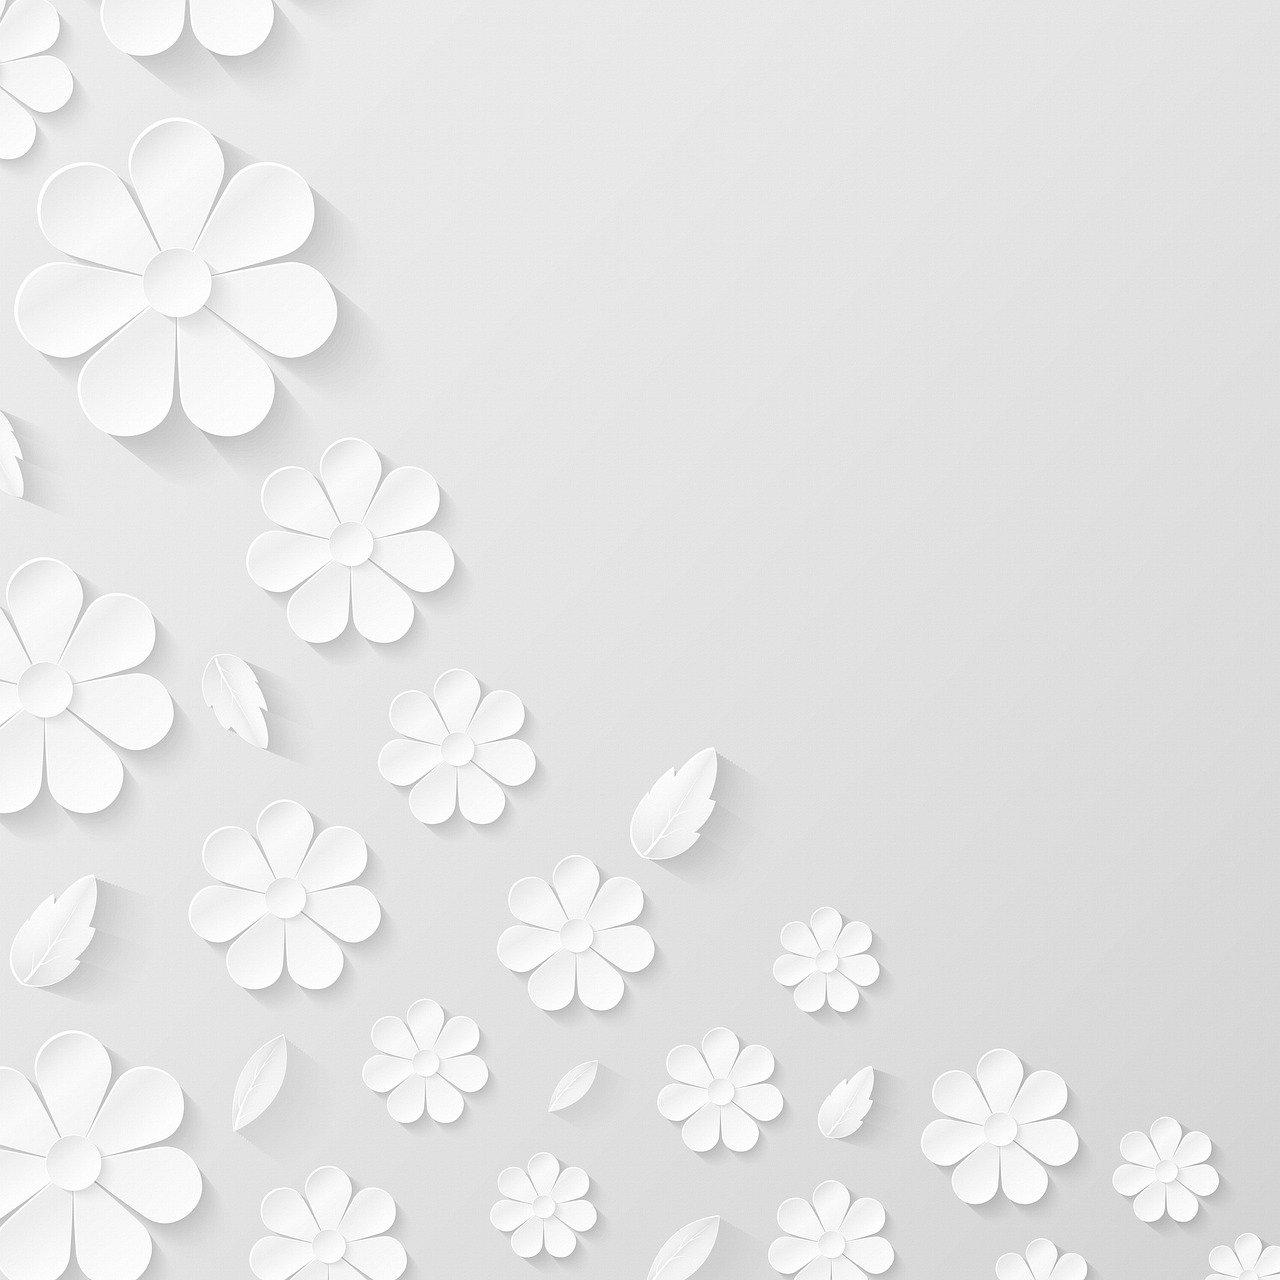 paper flower background, white, flowers